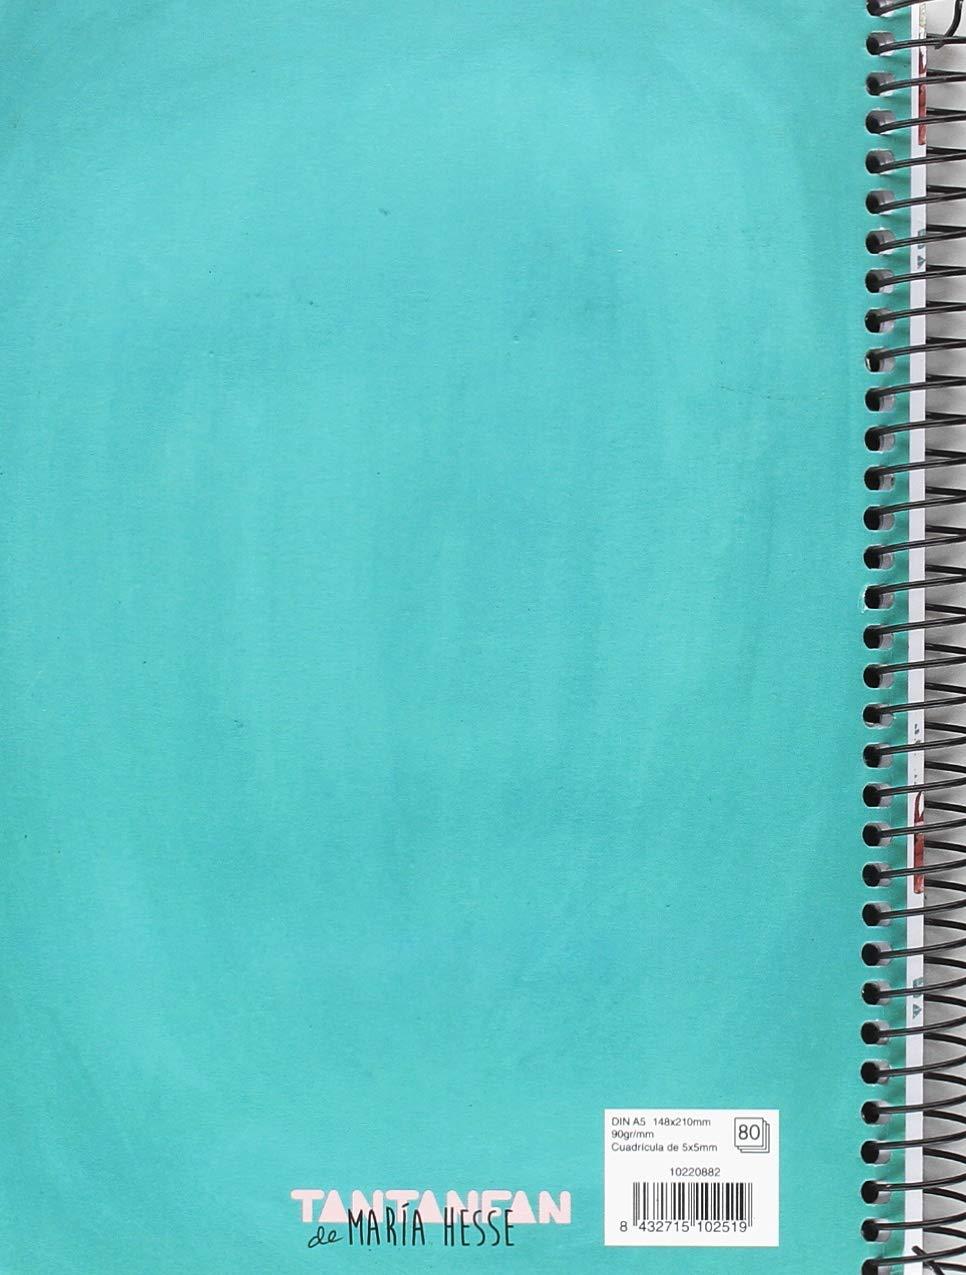 Pulp fiction Maria Hesse: Amazon.es: Vv.Aa: Libros